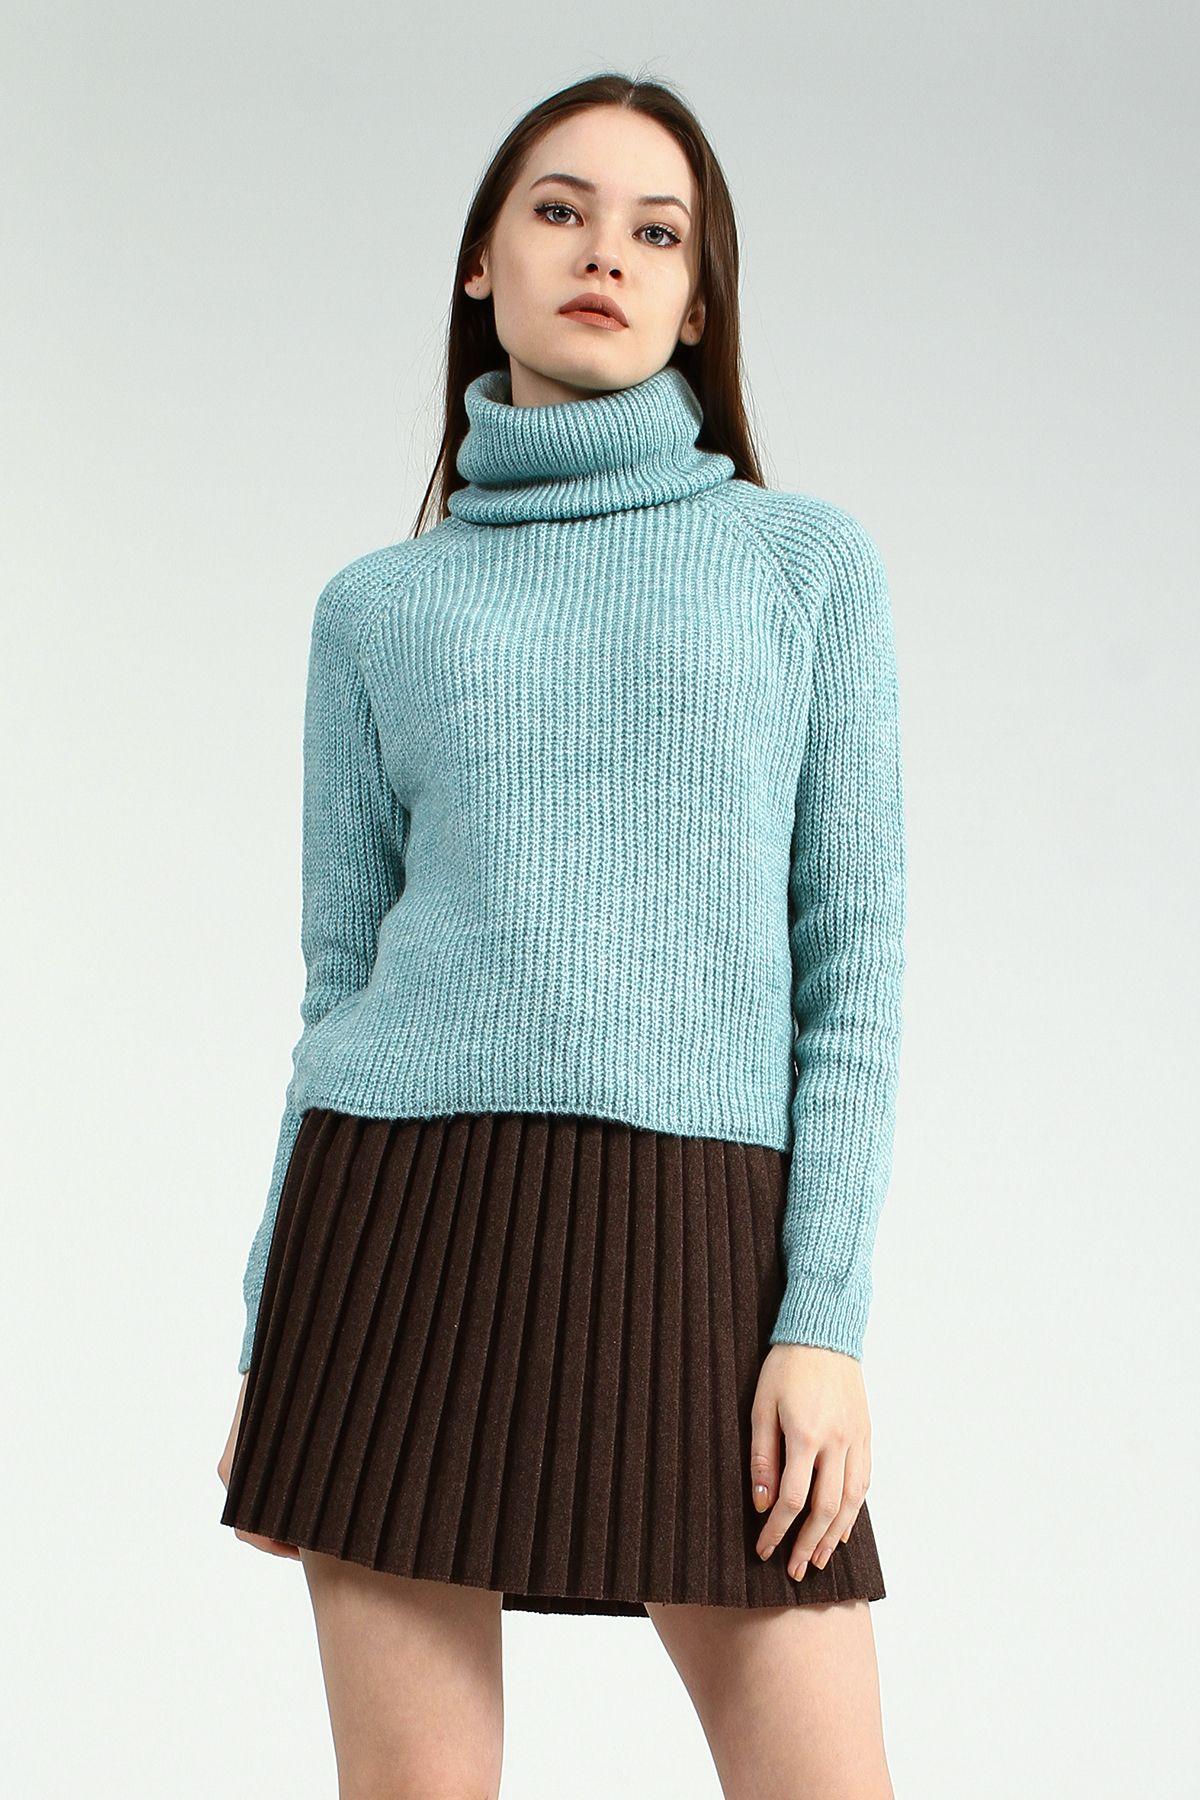 Bogazli Sac Orgu Desenli Uzun Yesil Triko Kazak Green Turtleneck Knitting Tunik Kazak Triko Tunik Bogazli Triko Kazak Elbise Mankenler